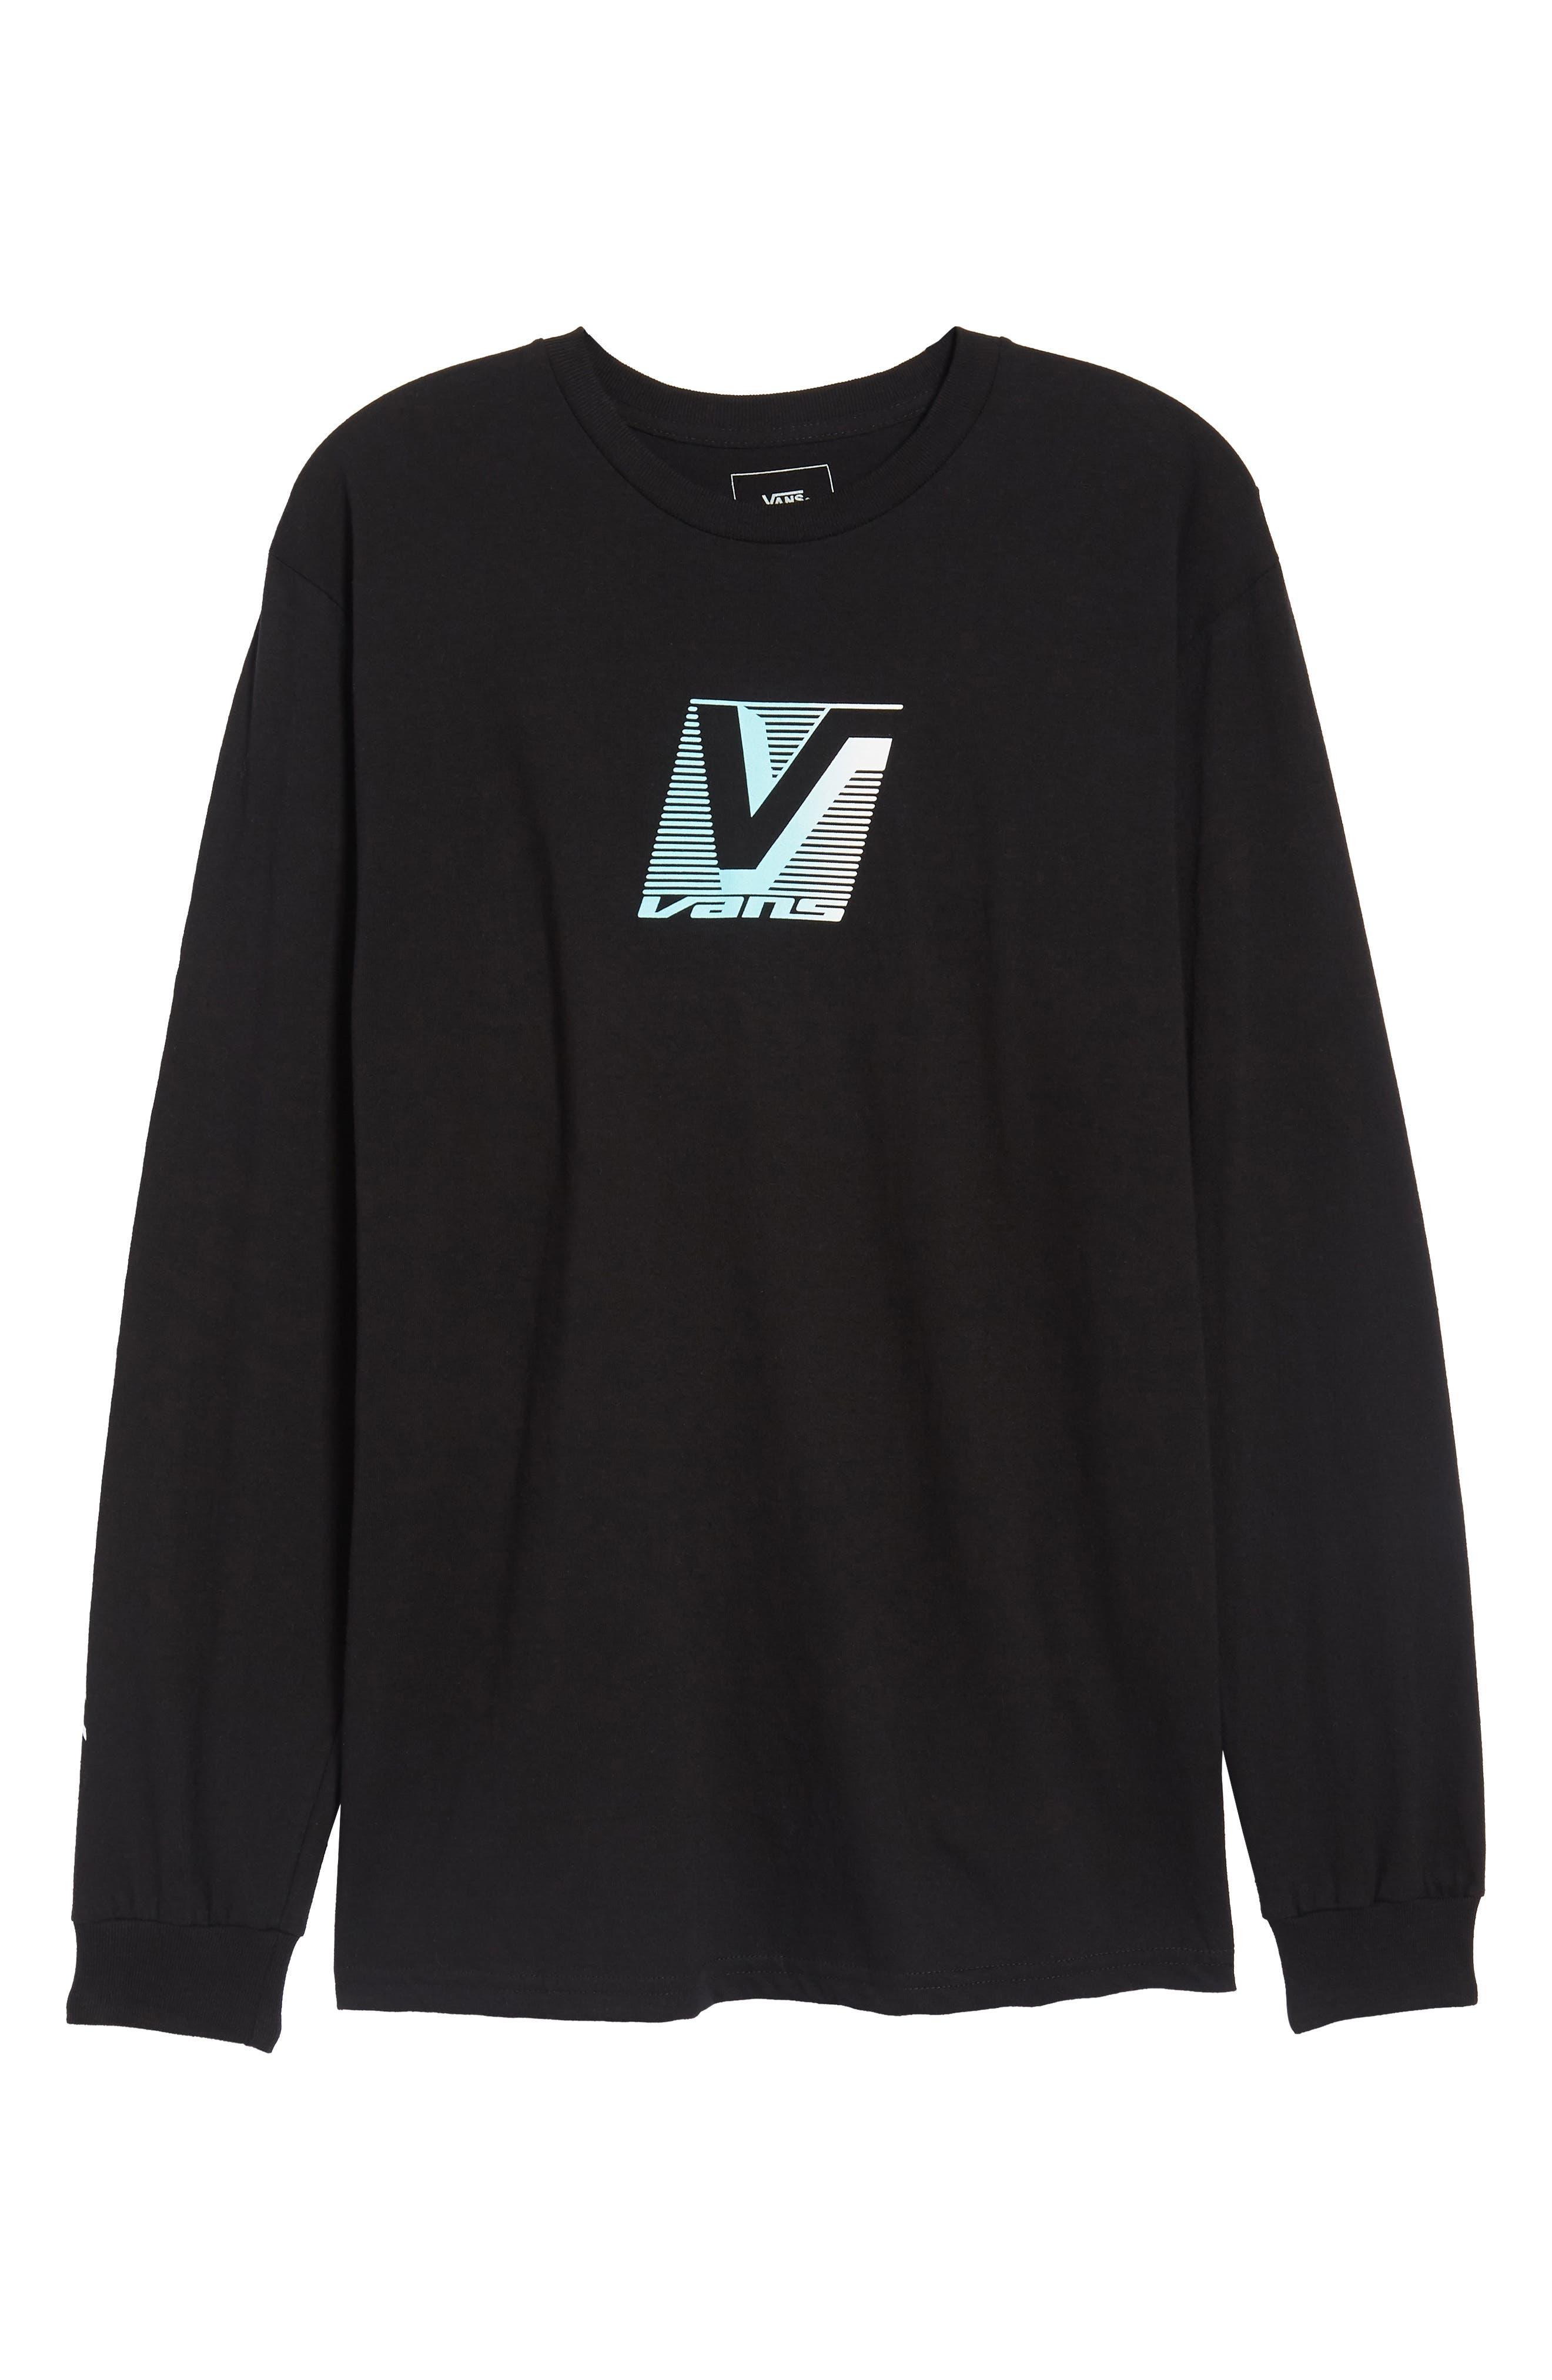 Grand Vans Graphic T-Shirt,                             Alternate thumbnail 6, color,                             001